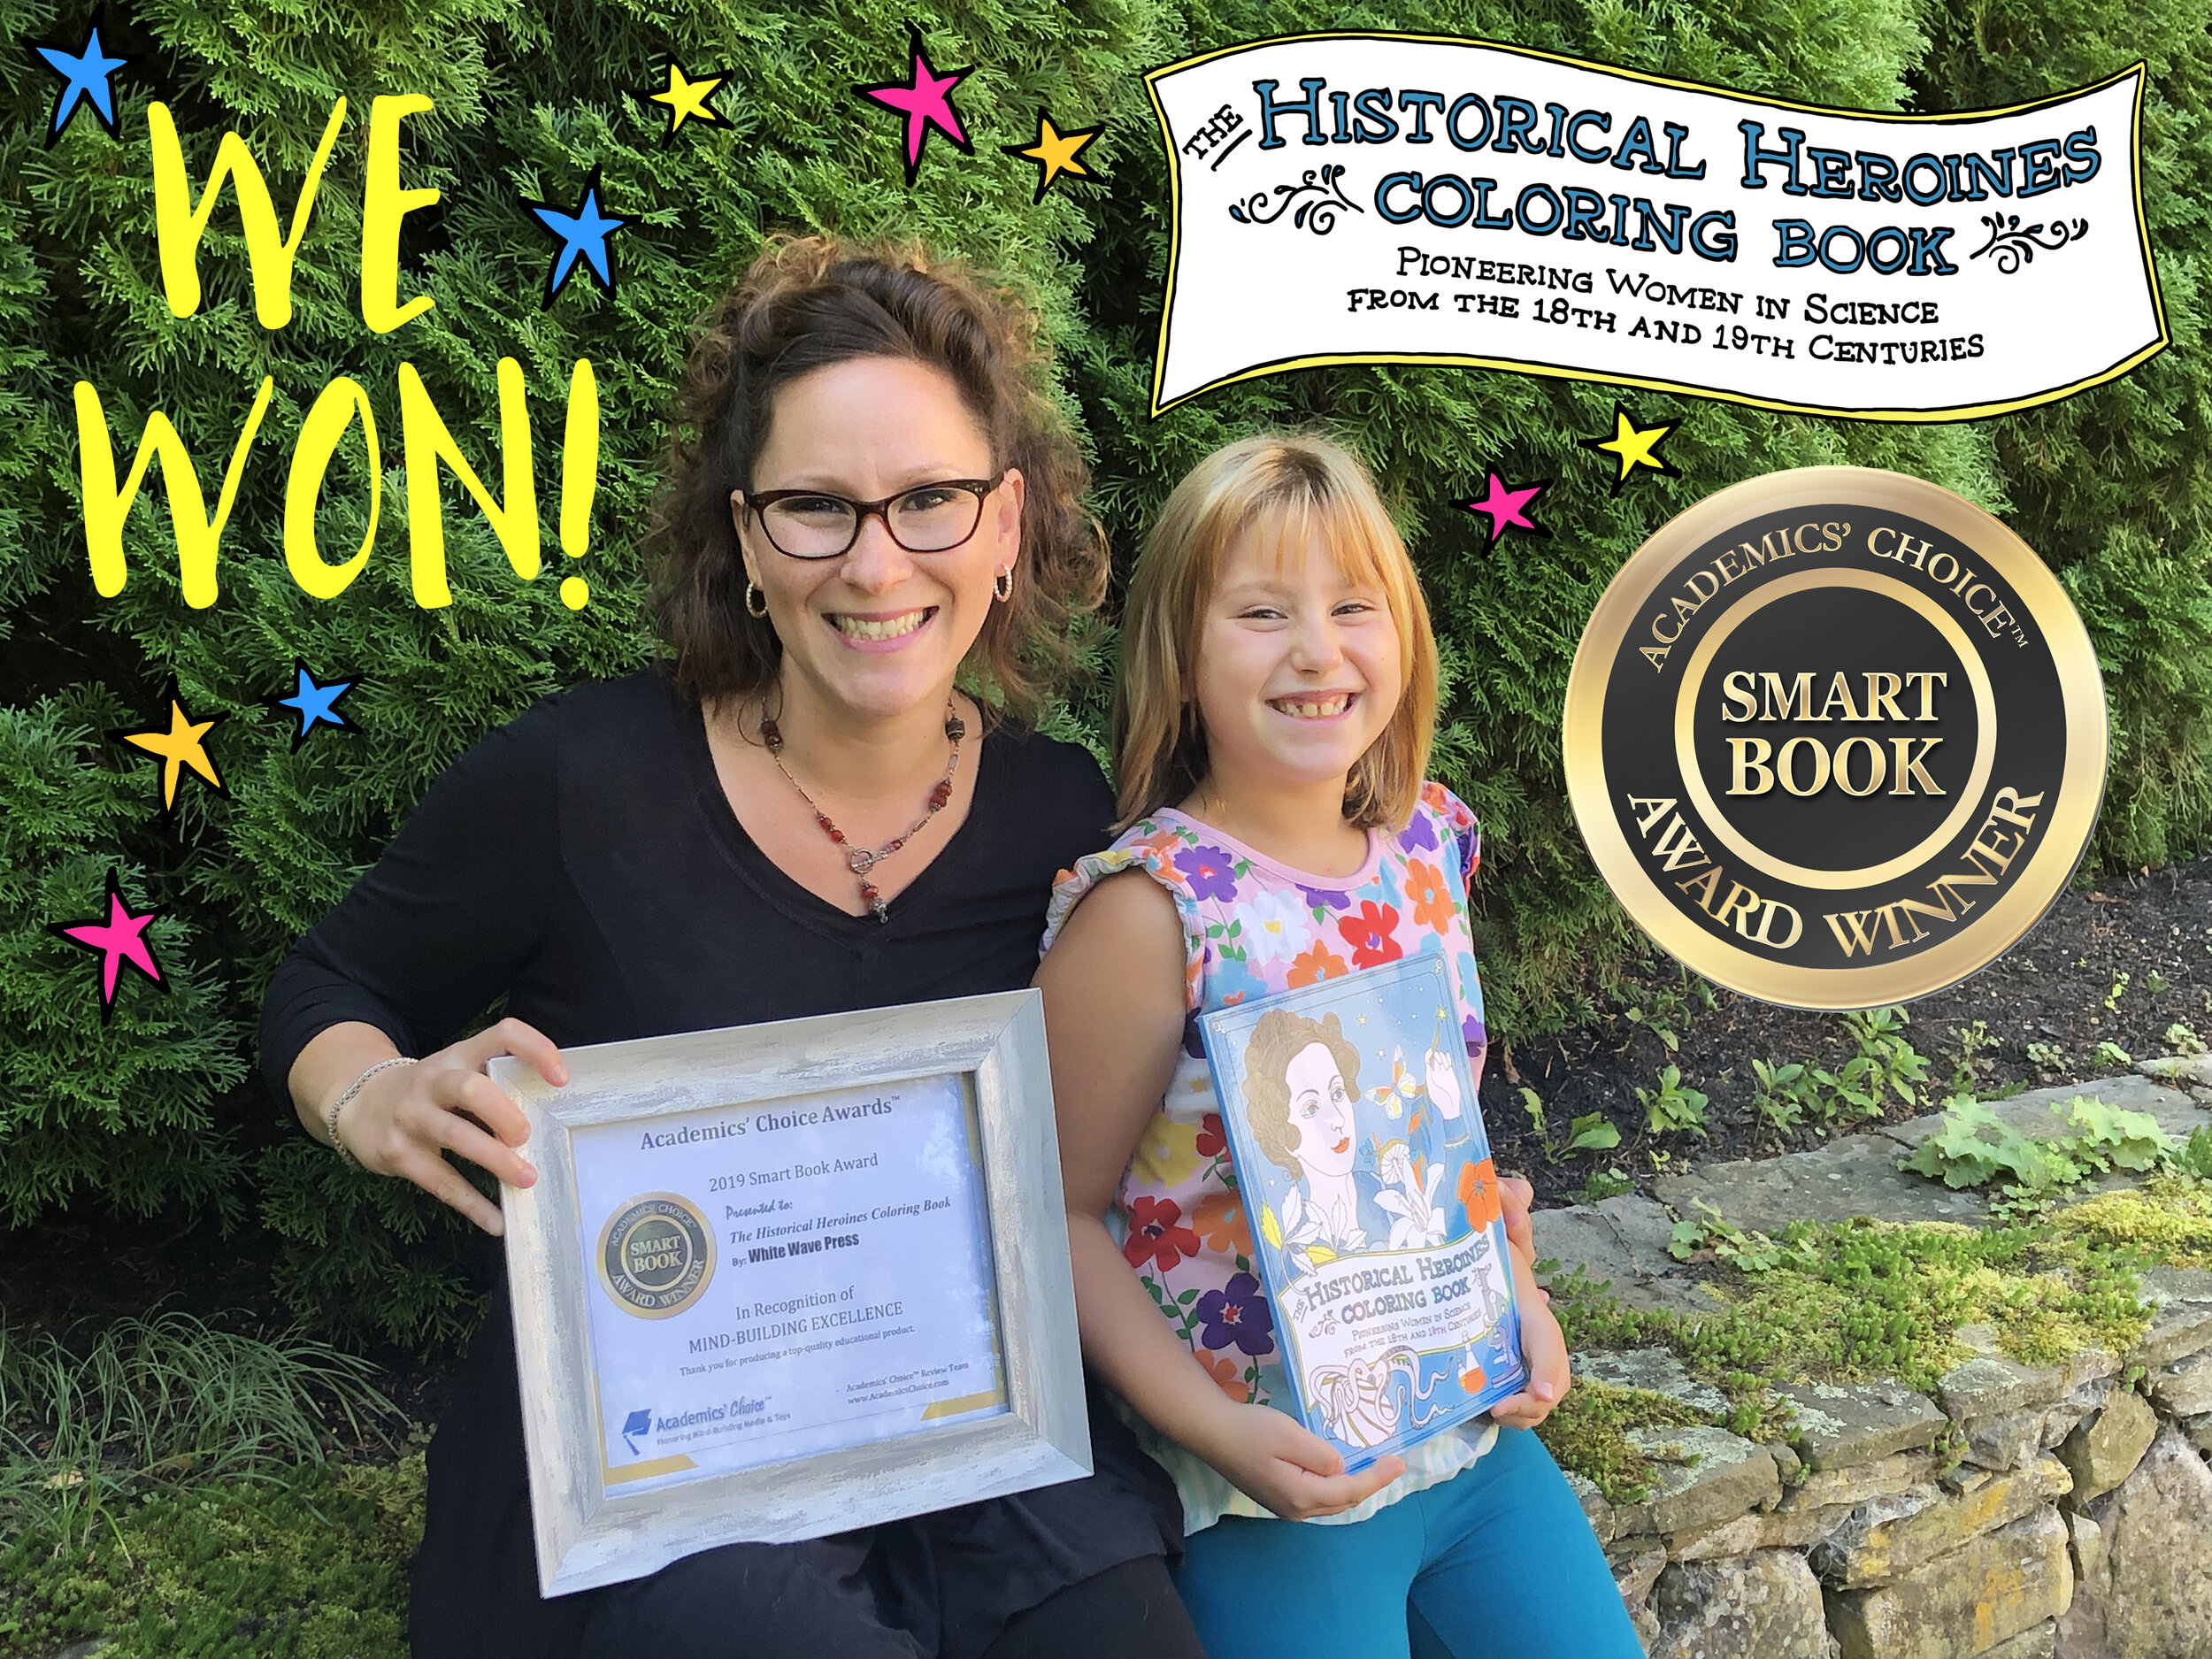 Smart Book Award.jpg